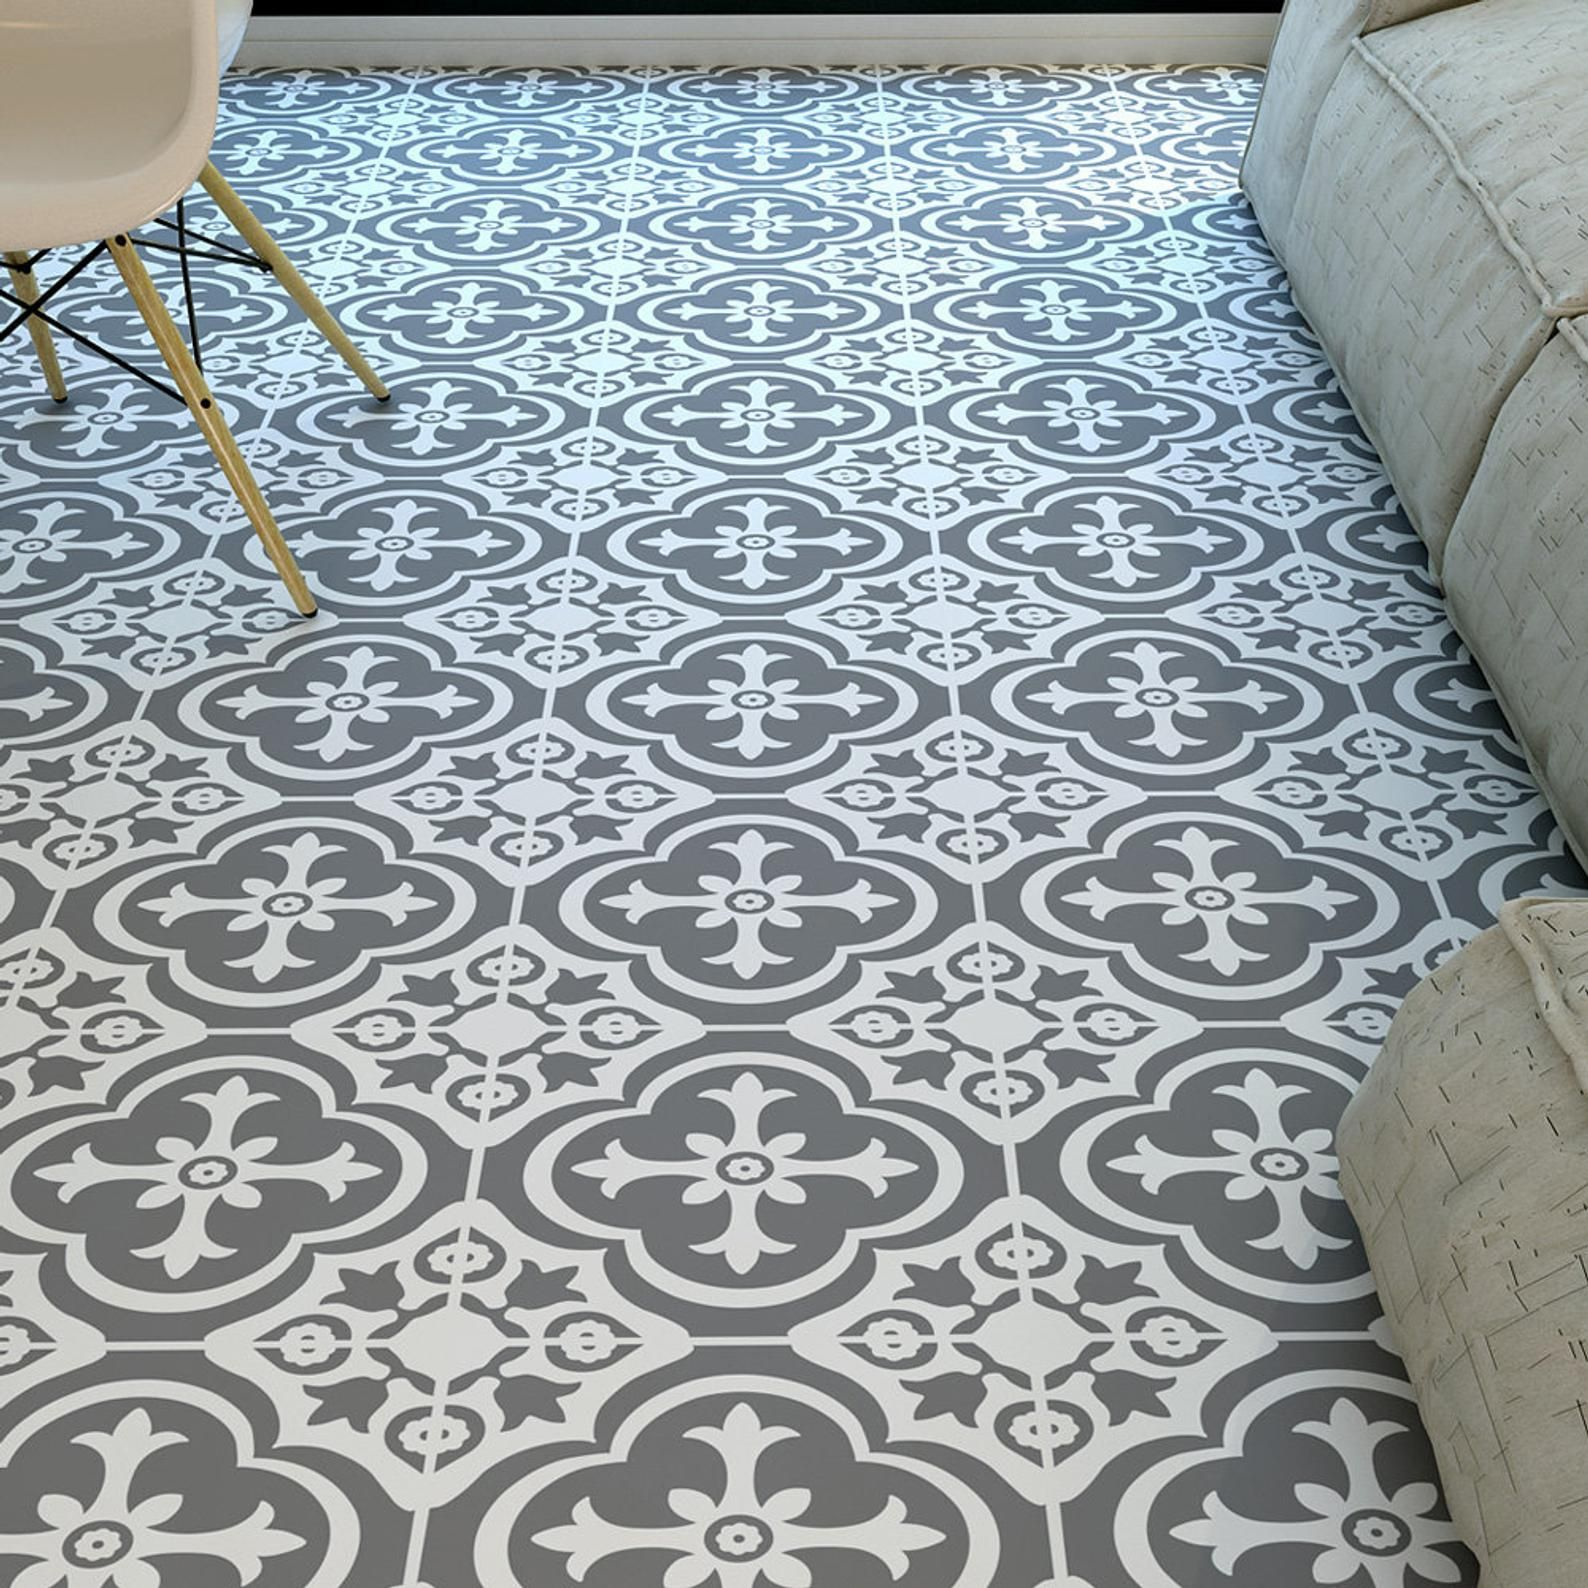 Home Decor Carrelage Adhesif Vinyl Floor Vinyl Flooring Etsy Vinyl Tile Vinyl Tile Flooring Flooring